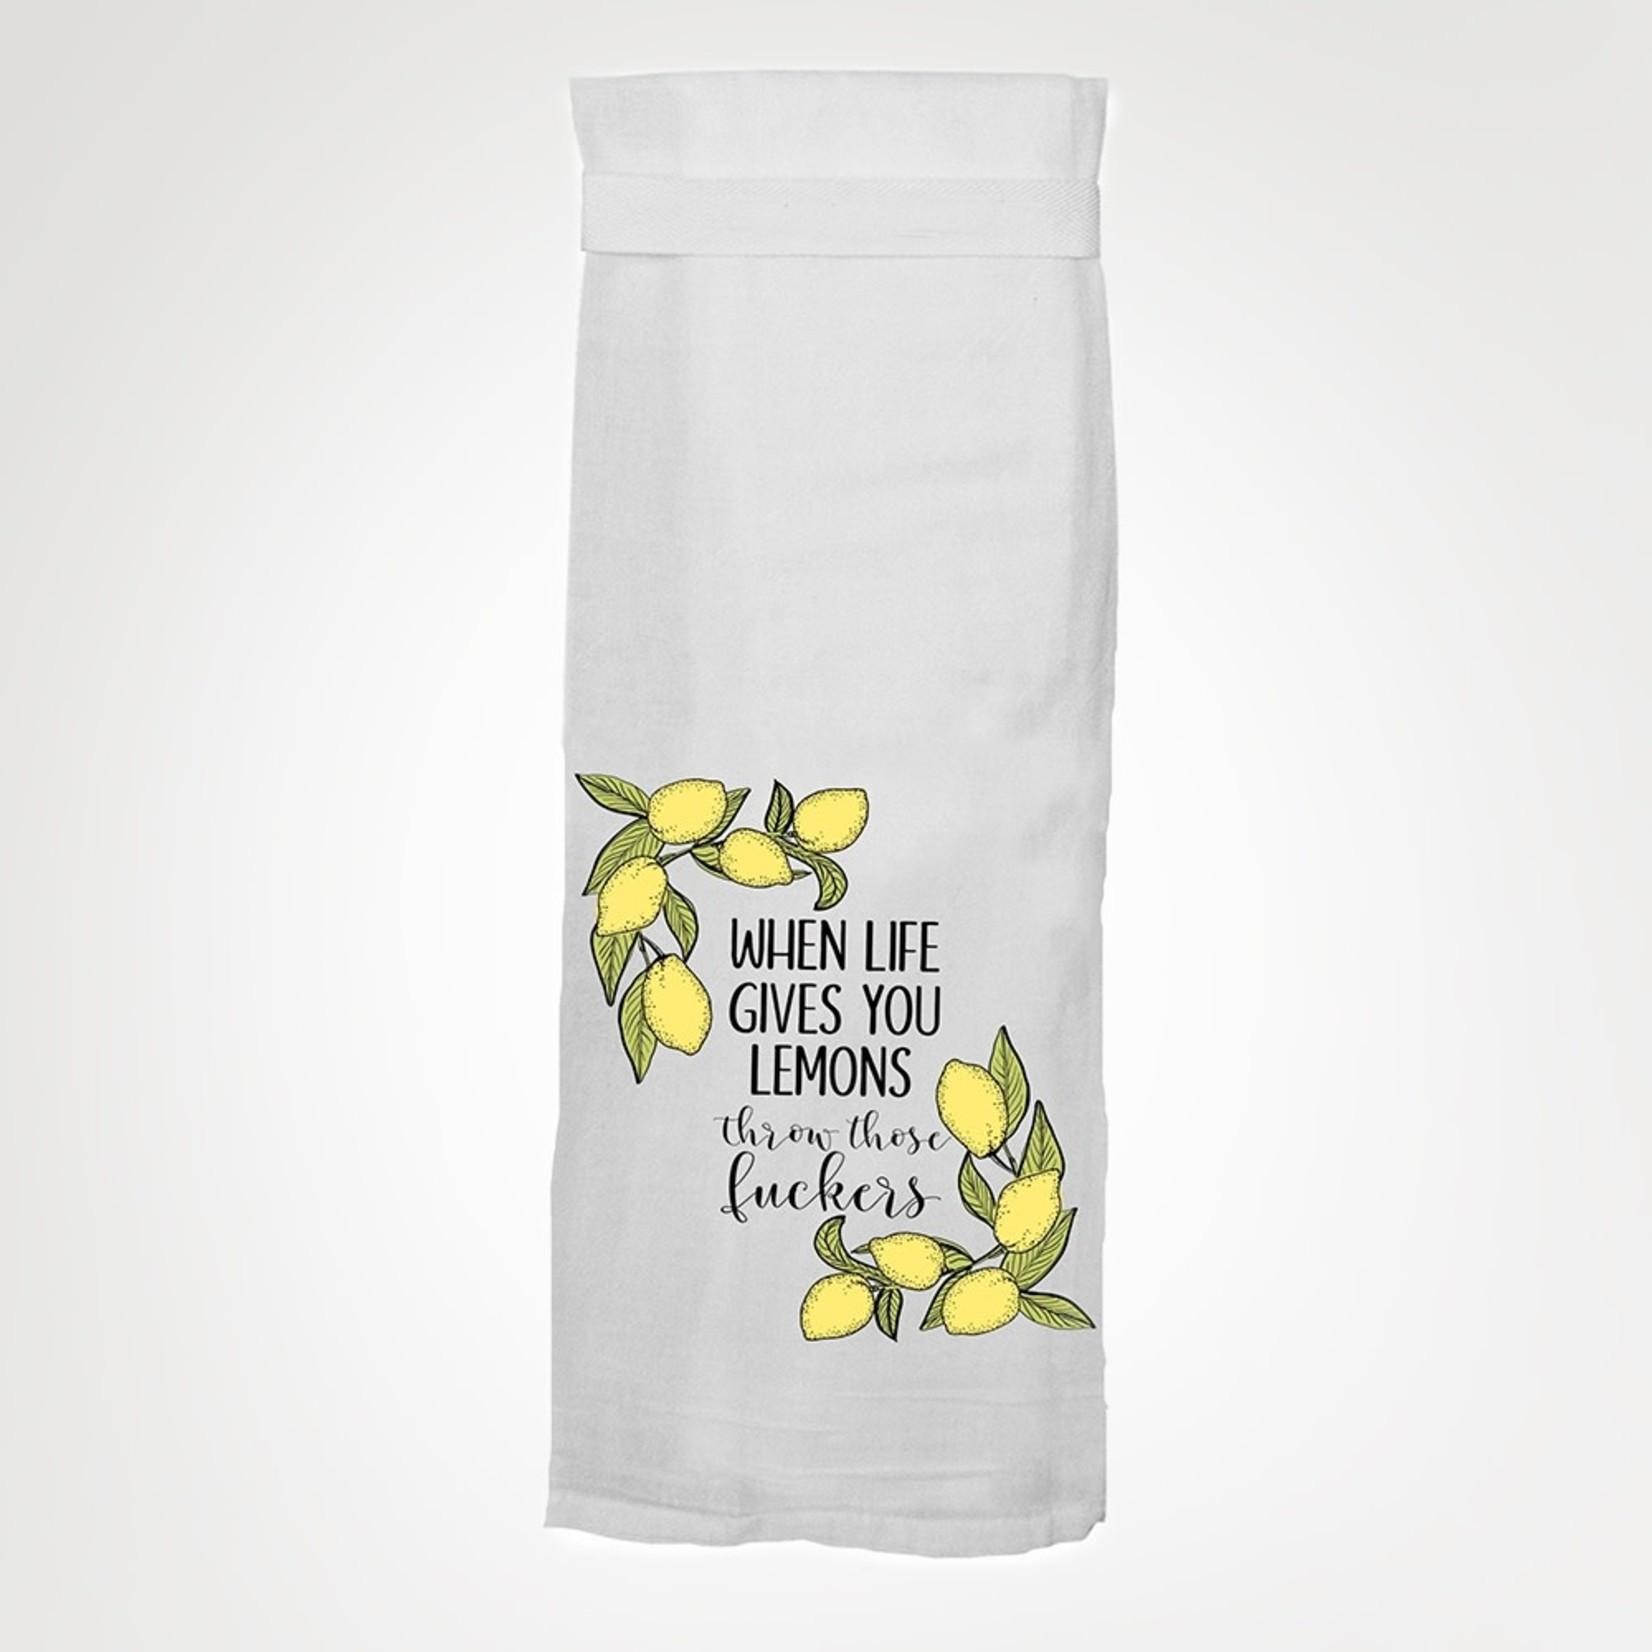 Dish Towel - When Life Gives Lemons, Throw Those Fuckers